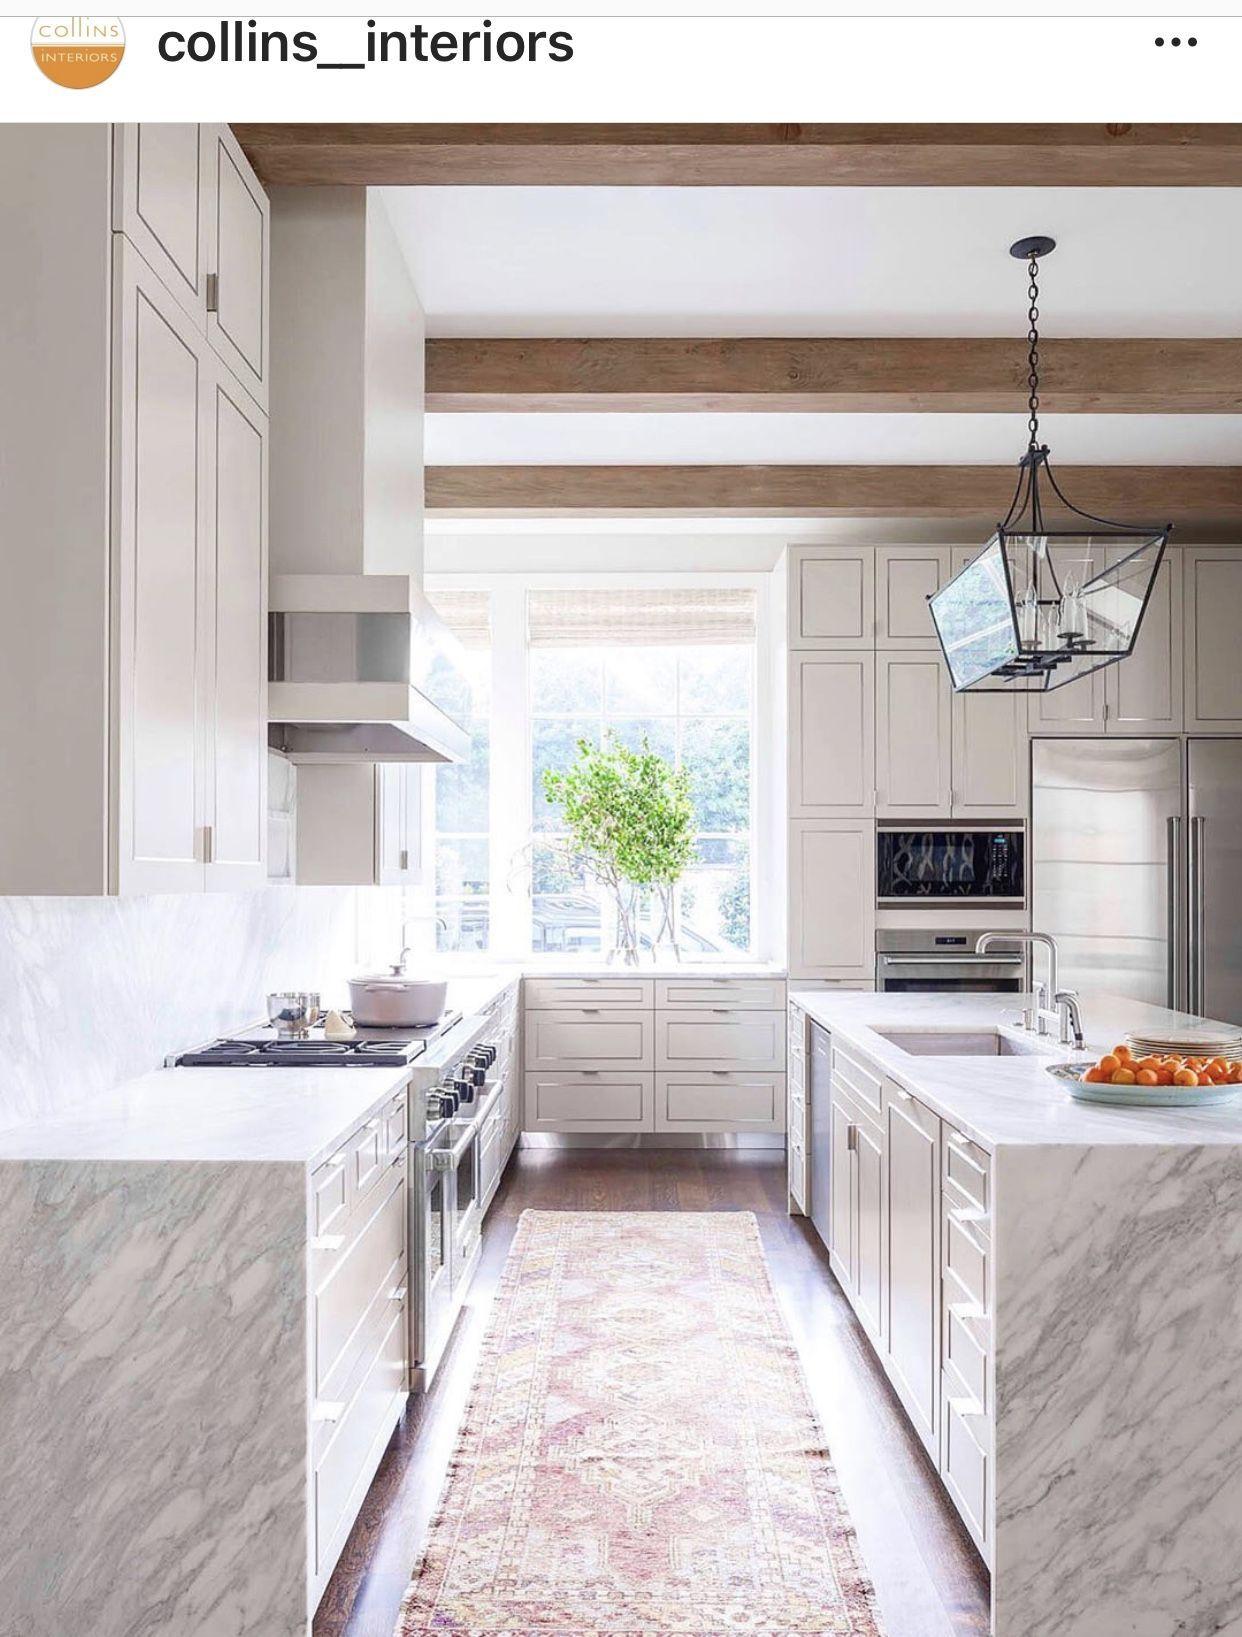 Cuisine Contemporaine Cuisine Contemporaine Blanche Cuisine Contemporaine Blanche E In 2020 Kitchen Cabinets Grey And White Contemporary Kitchen Modern Kitchen Rugs